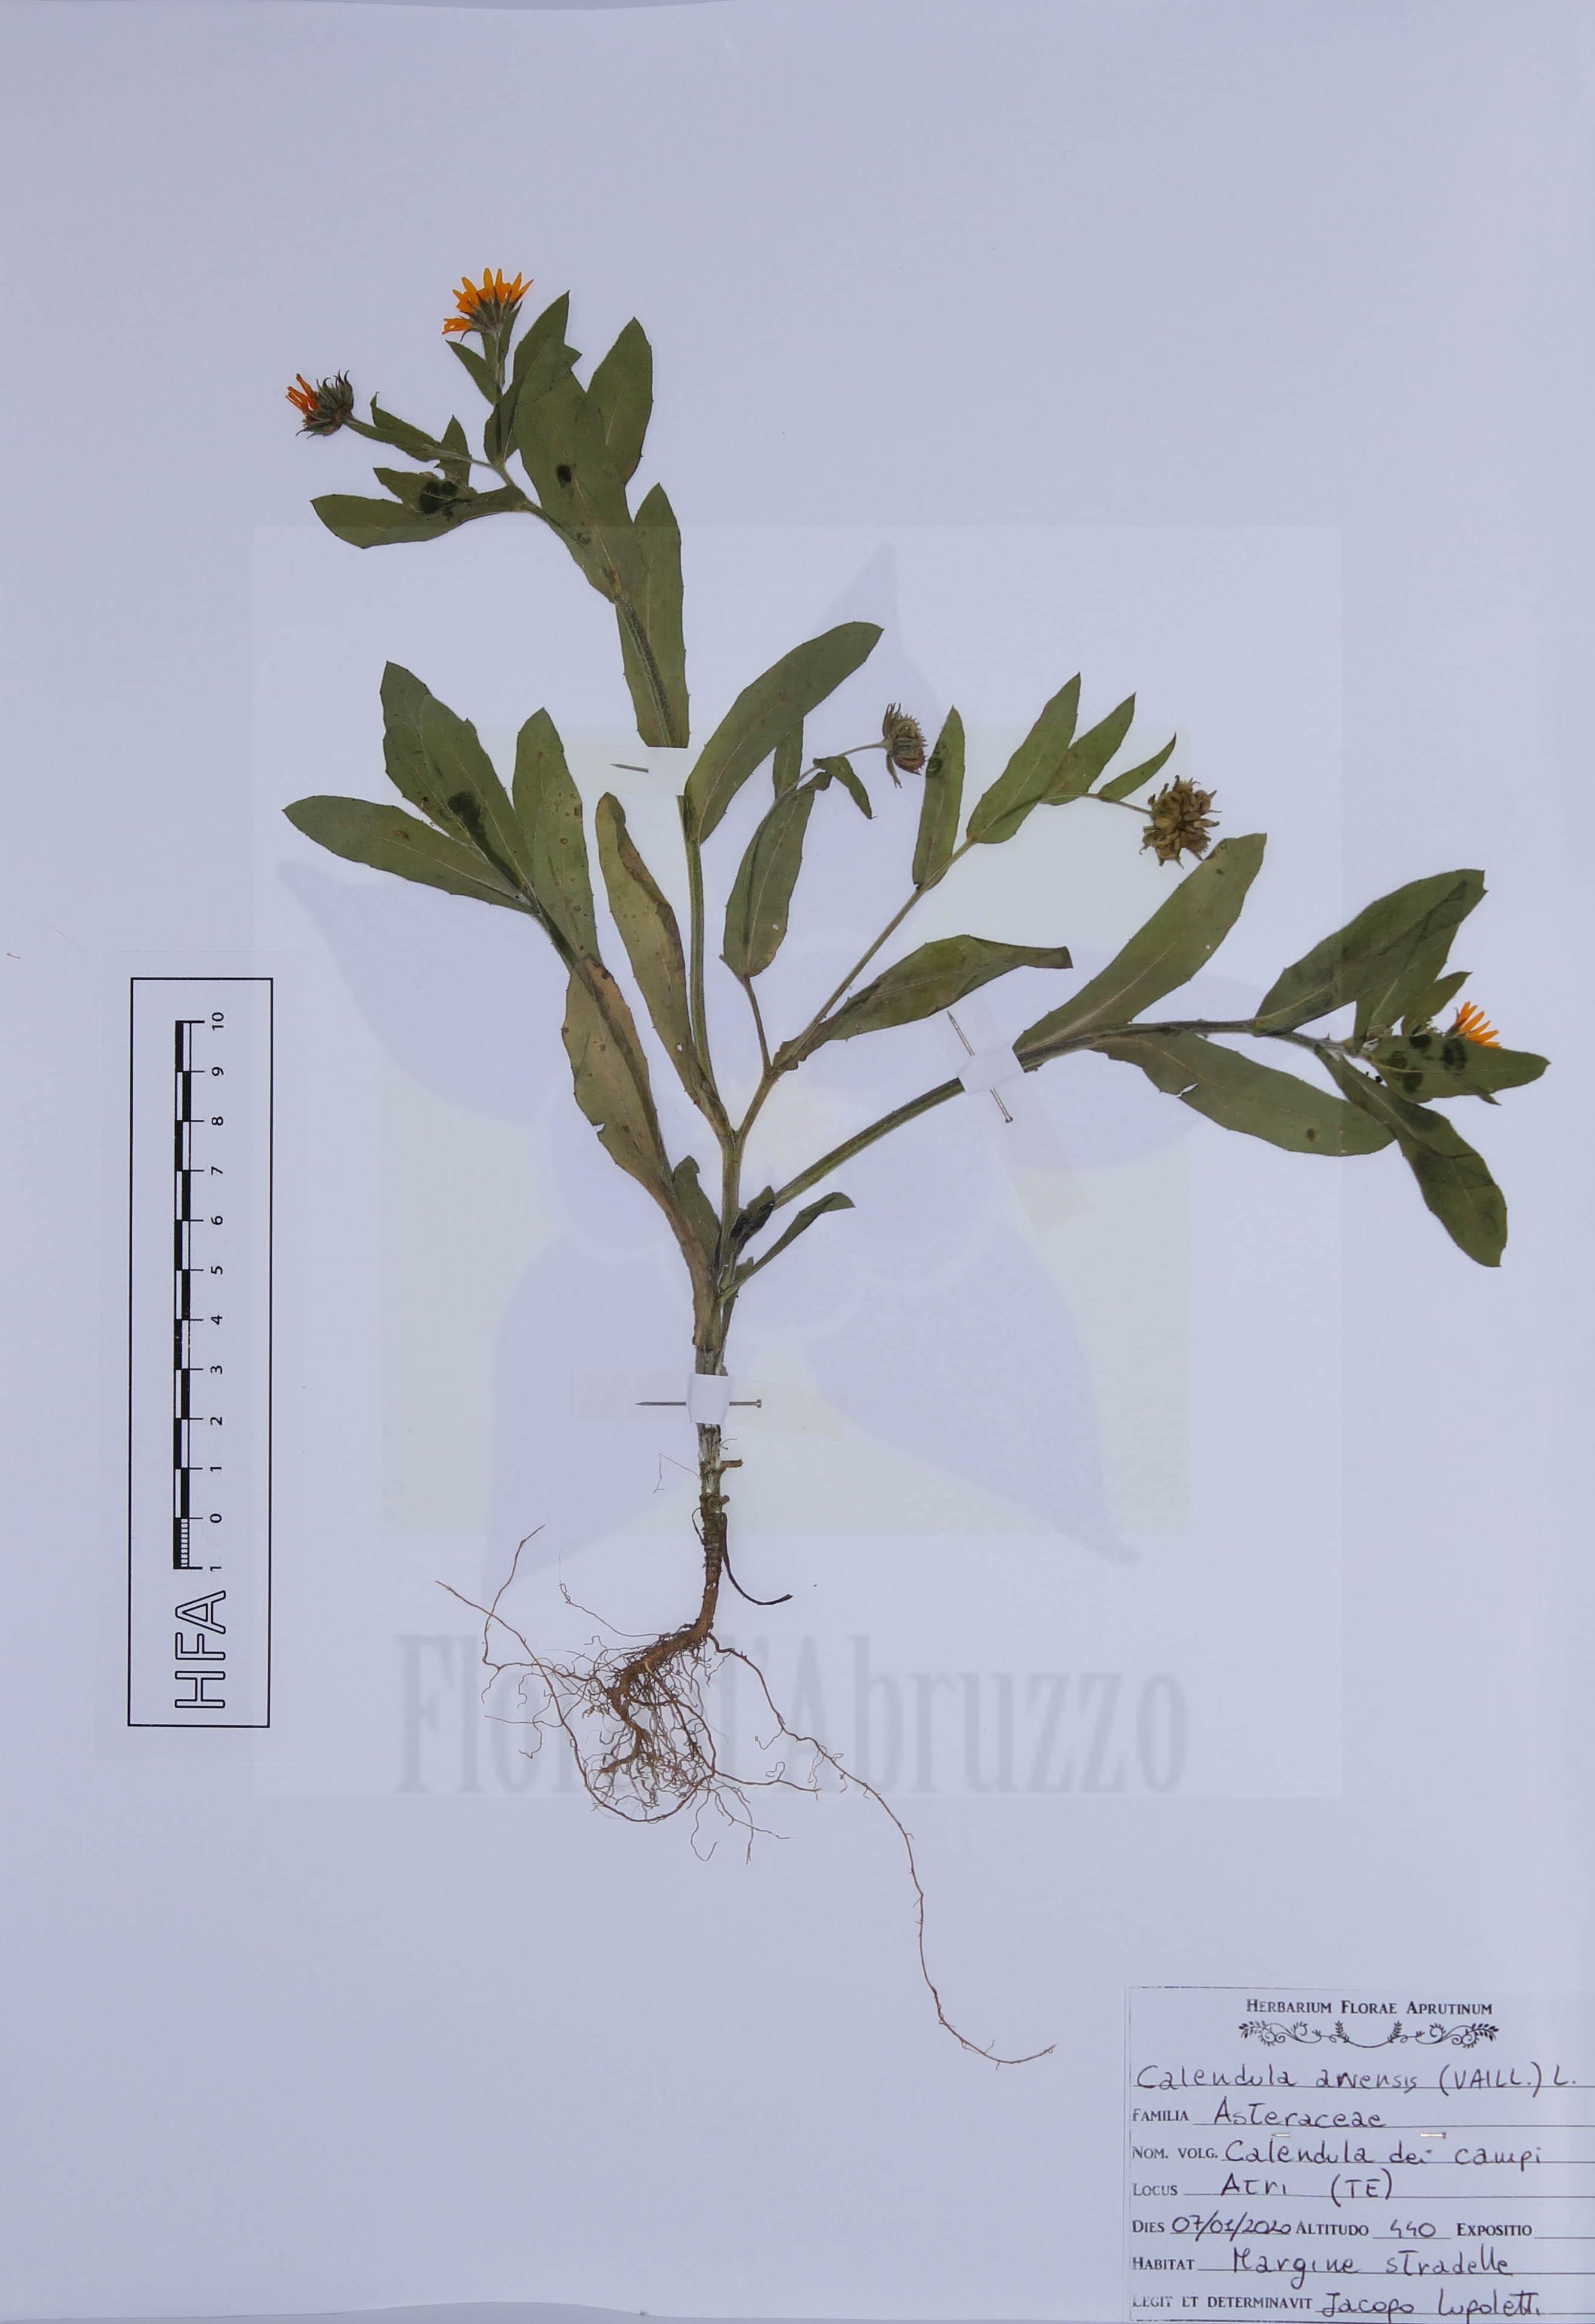 Calendula arvensis (Vaill.) L.